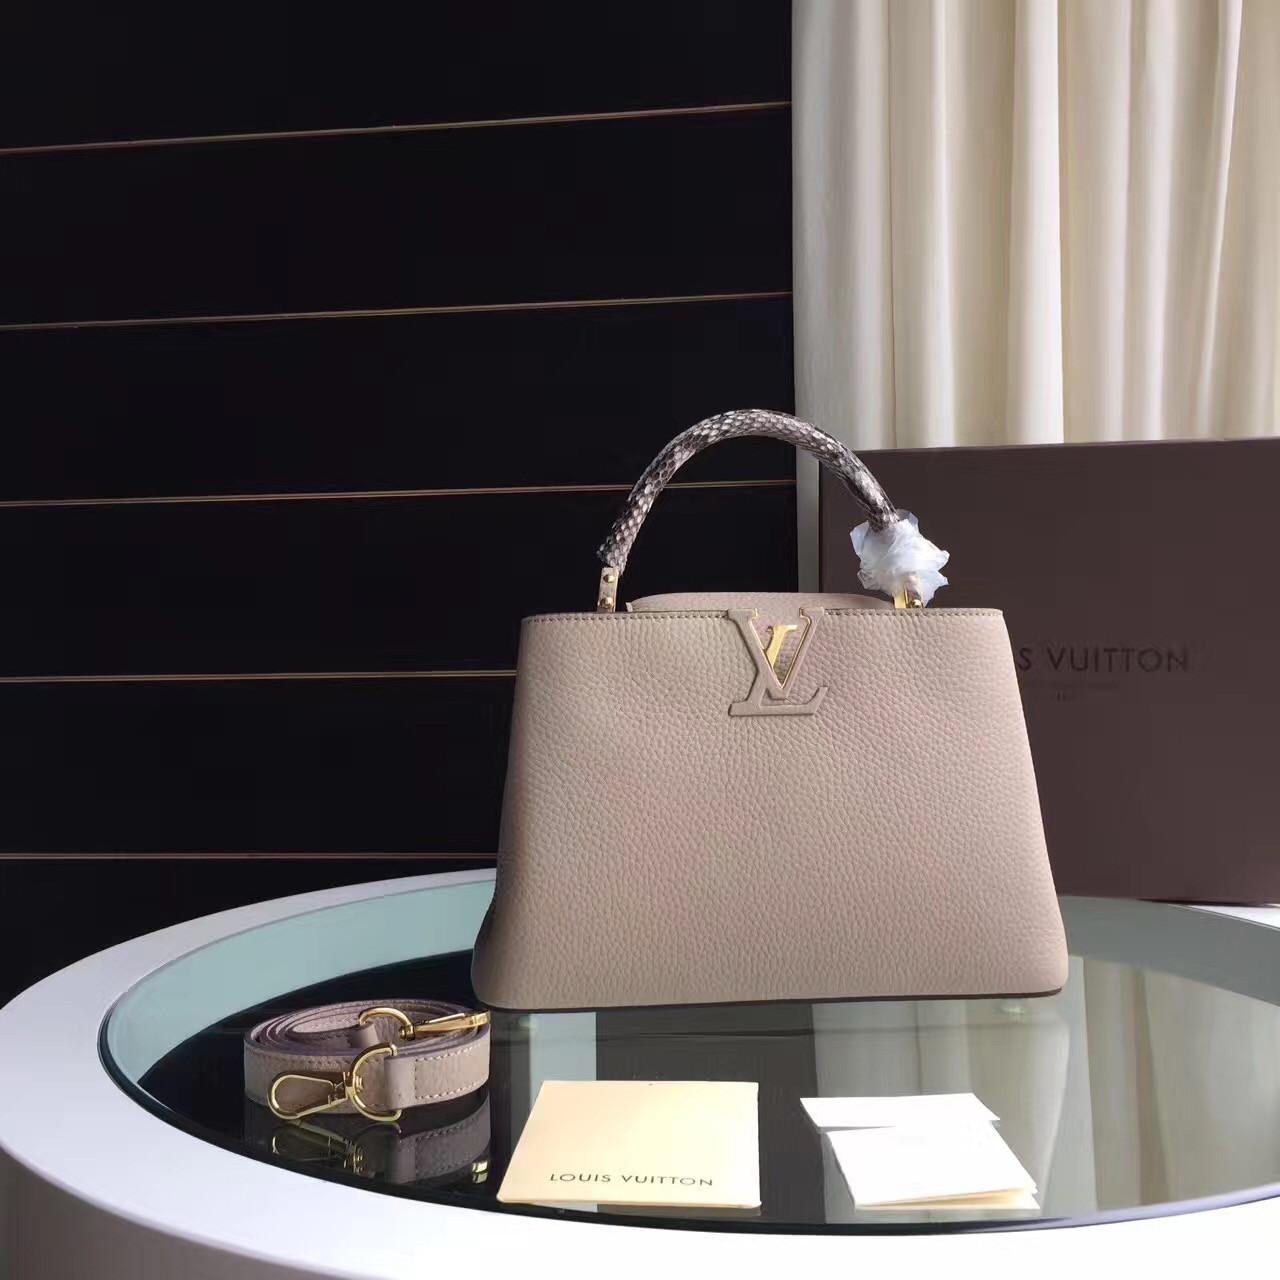 1082d65ec6f3 Louis Vuitton Capucines - женская сумка   vkstore.com.ua